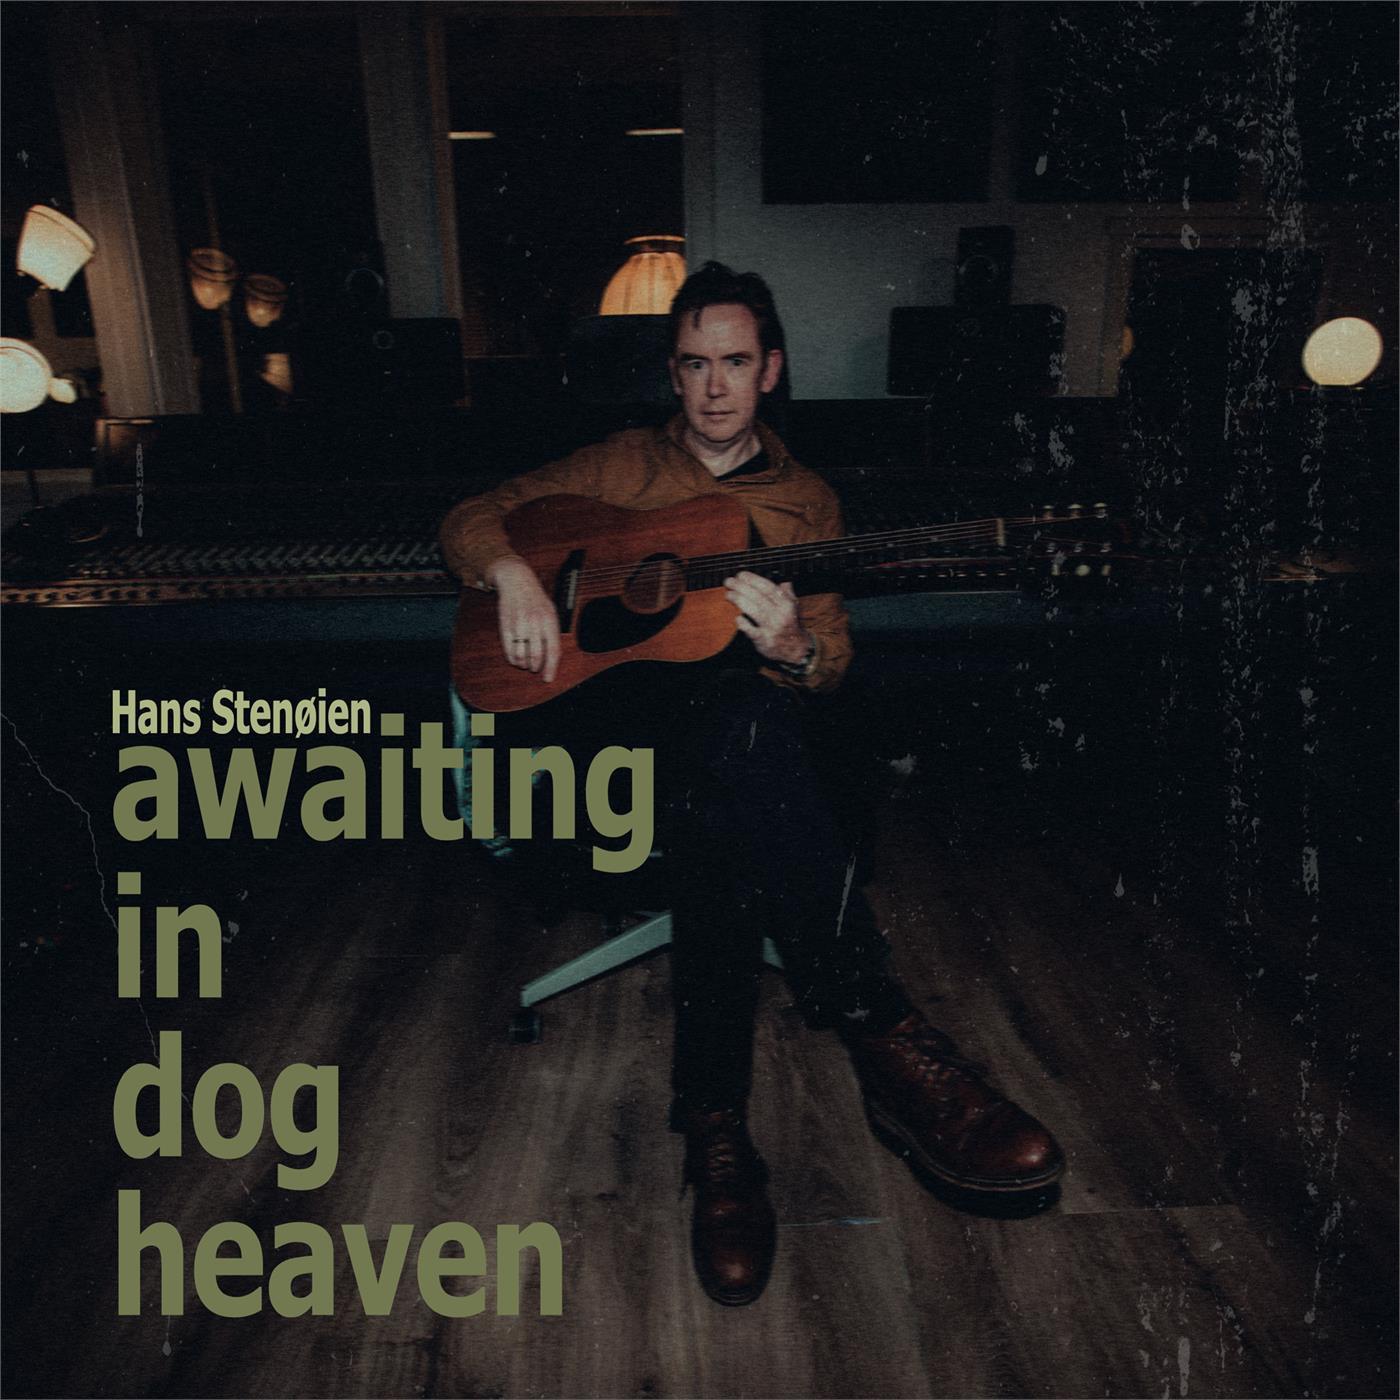 Hans Stenøien - Awaiting in Dog Heaven [LP]